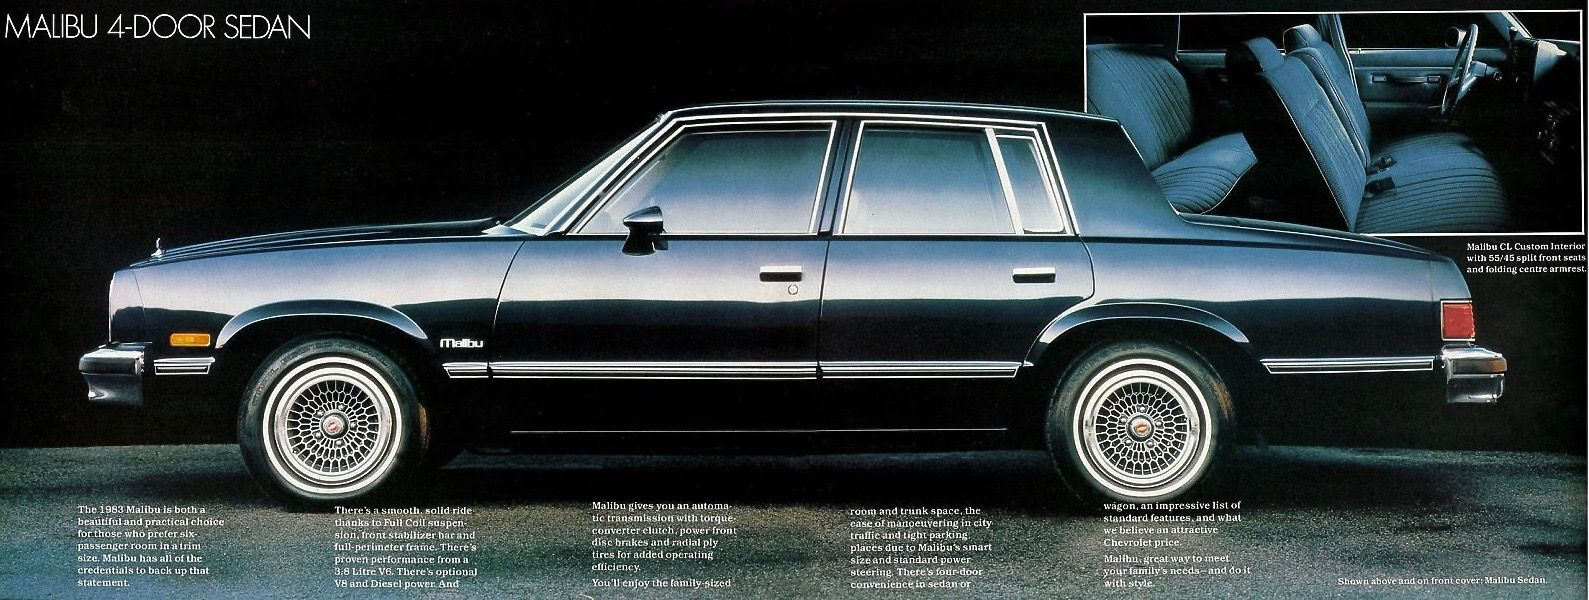 1983 Chevrolet Malibu Chevrolet Malibu Chevy Malibu Chevrolet